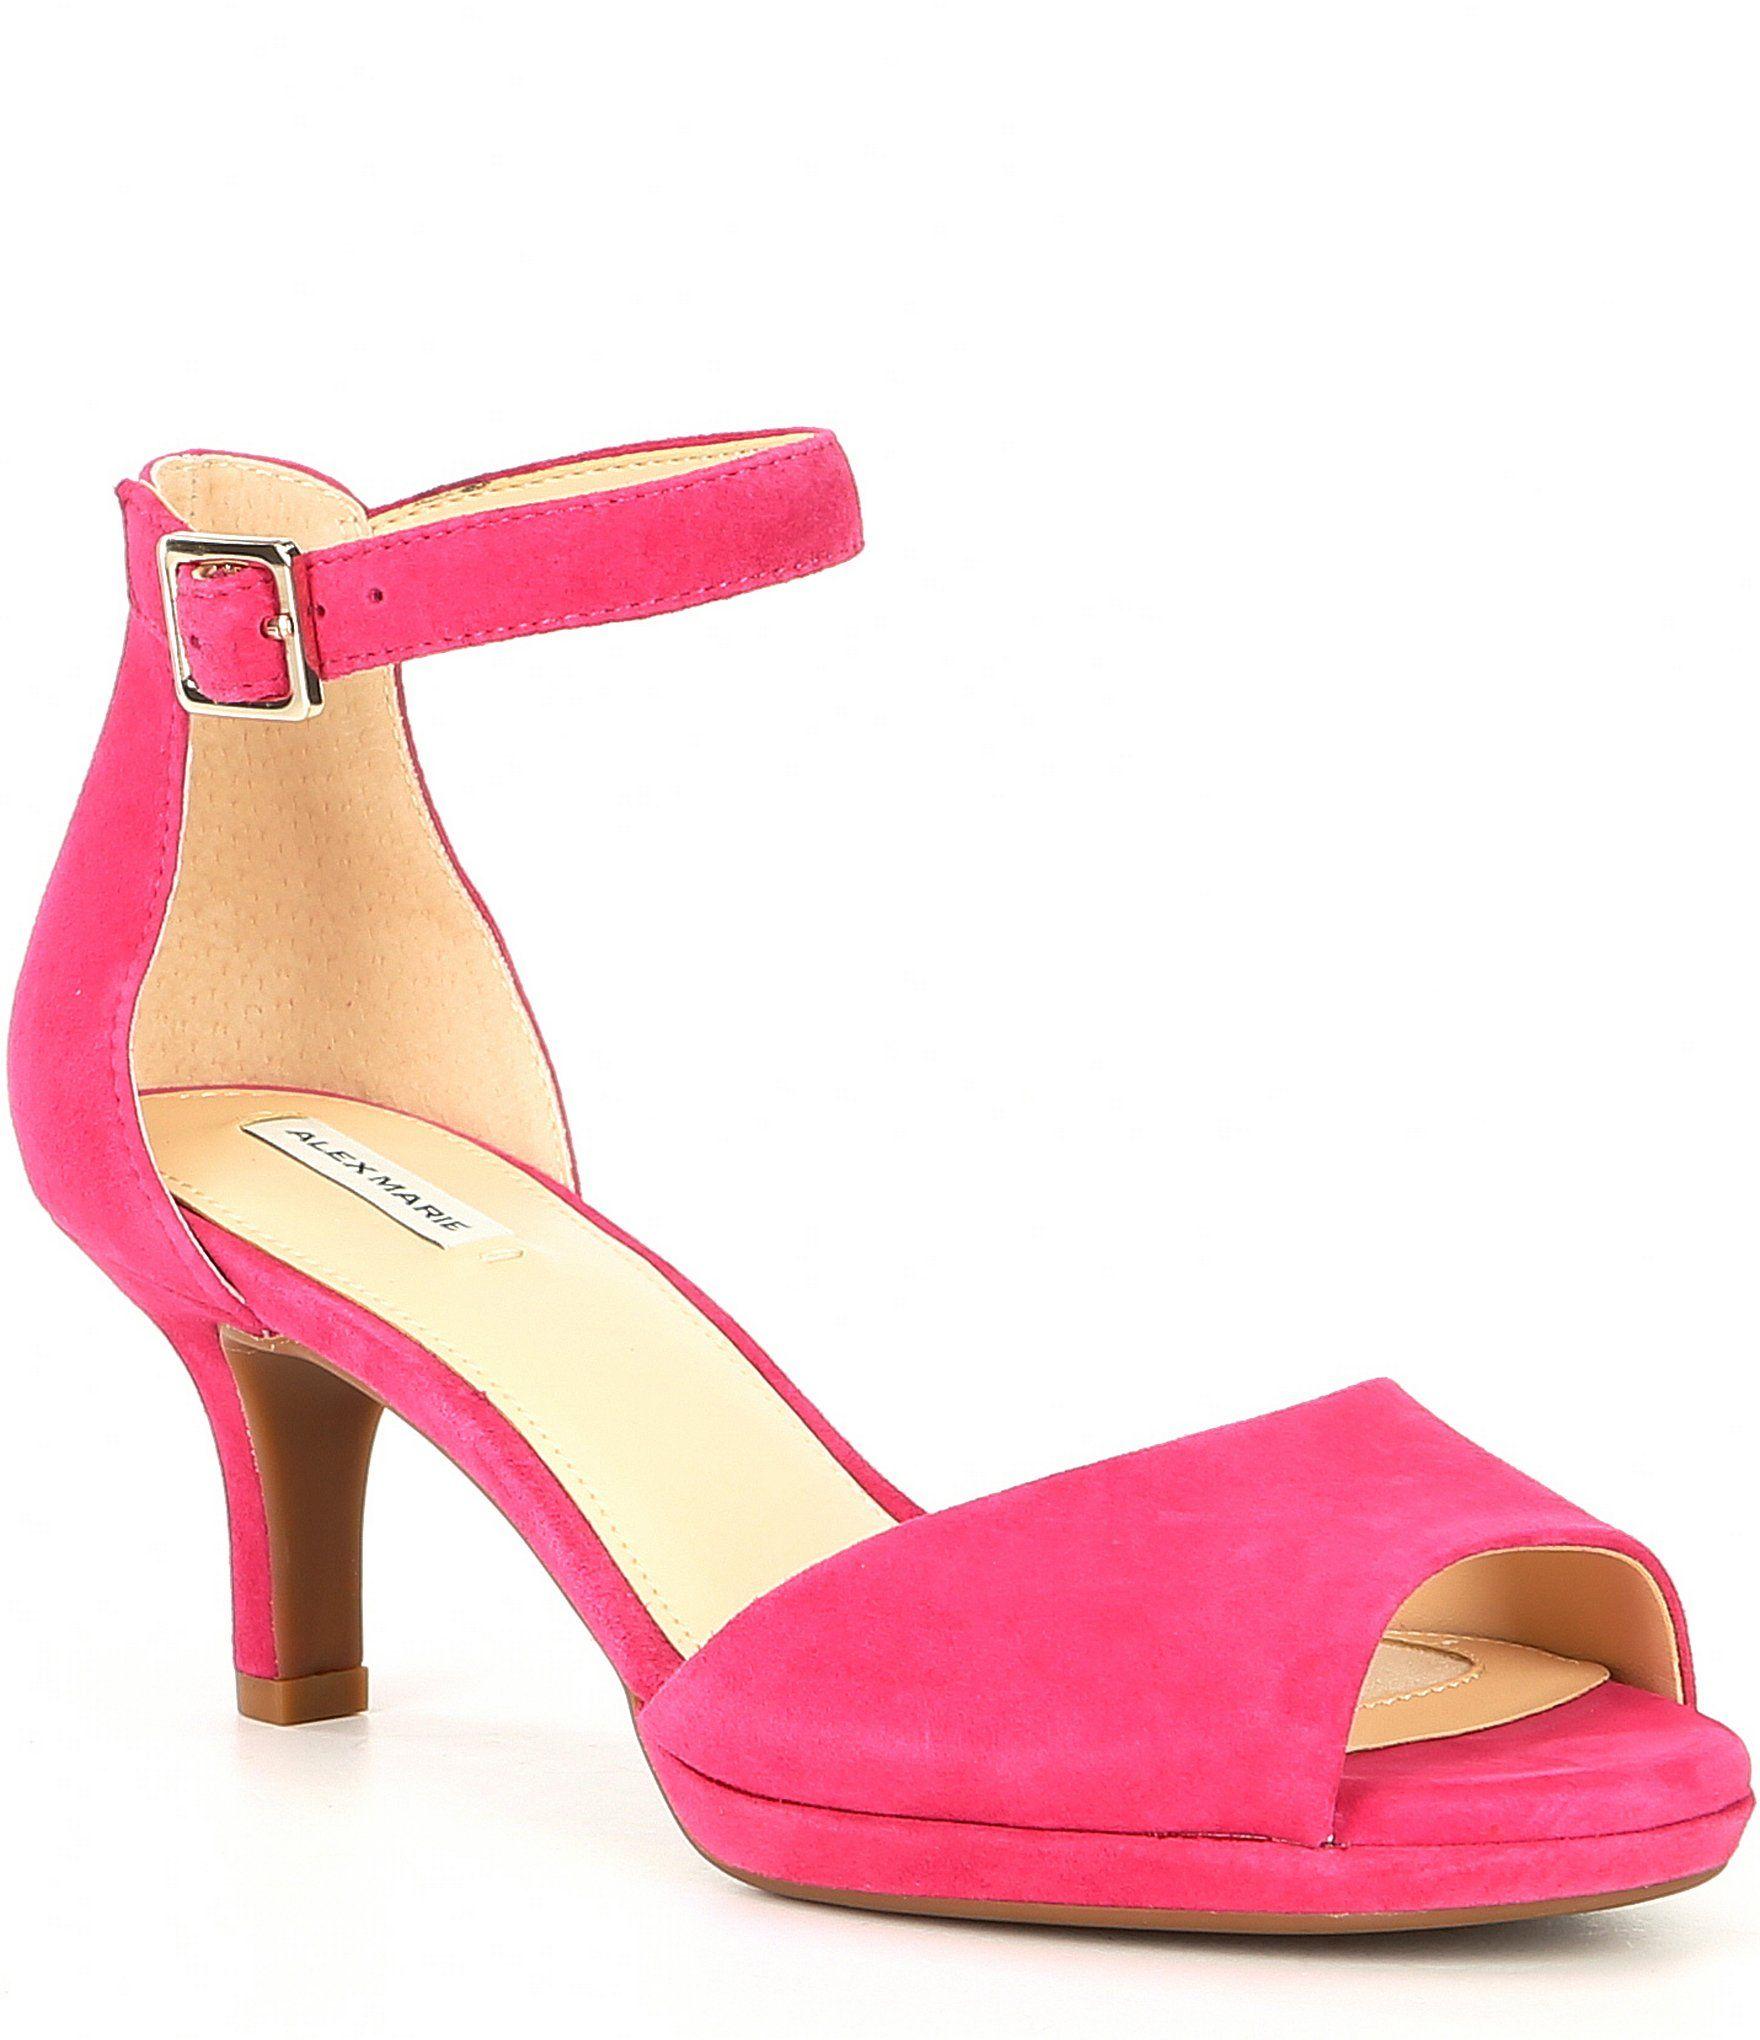 Alex Marie Bevali Suede Ankle-Strap Platform Sandals | Dillard's 2